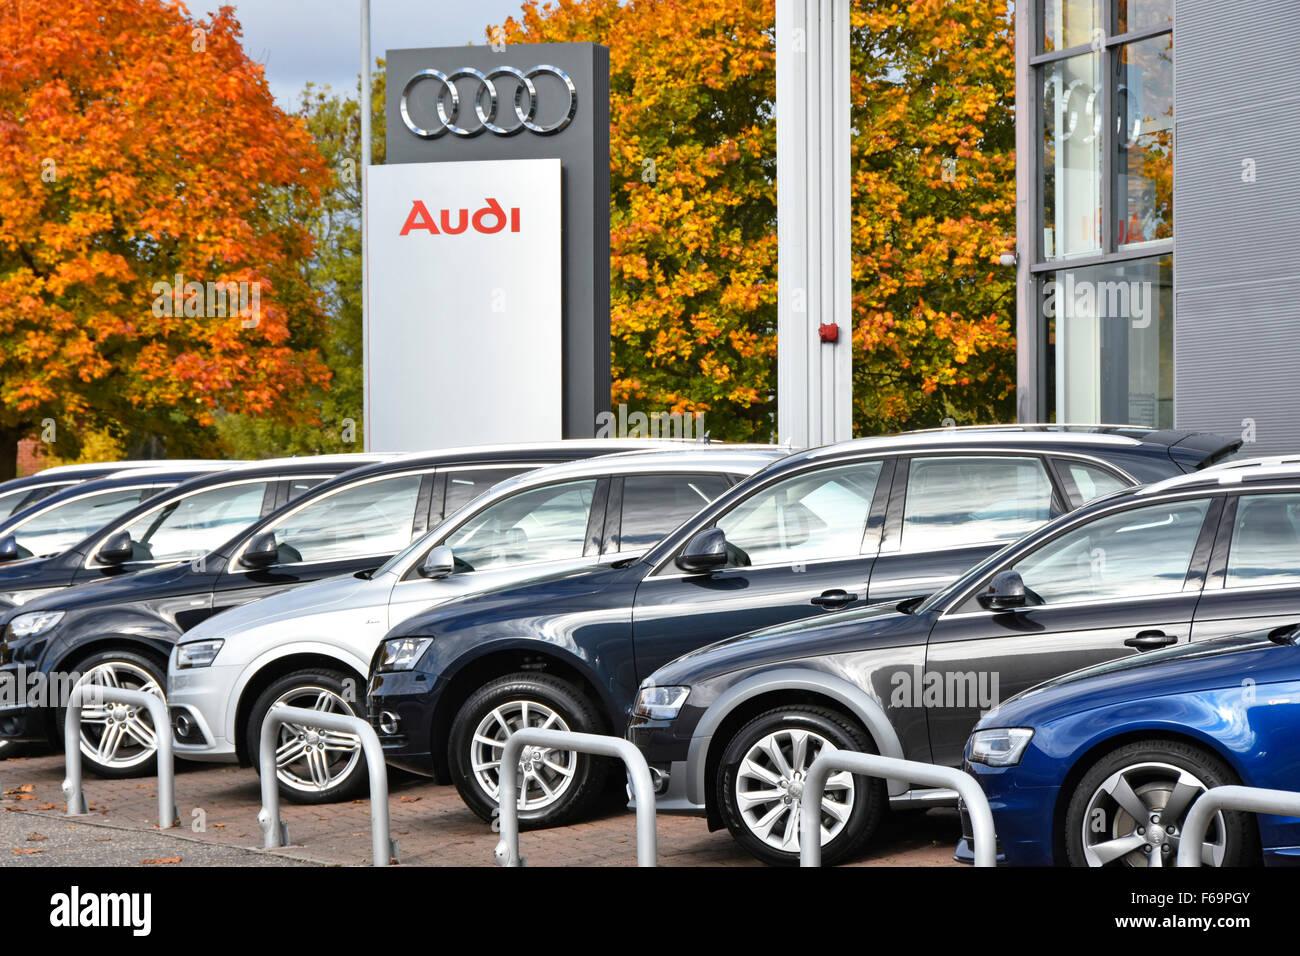 Car dealership Audi car dealer sign with cars for sale outside car showroom on forecourt Essex England UK end of - Stock Image